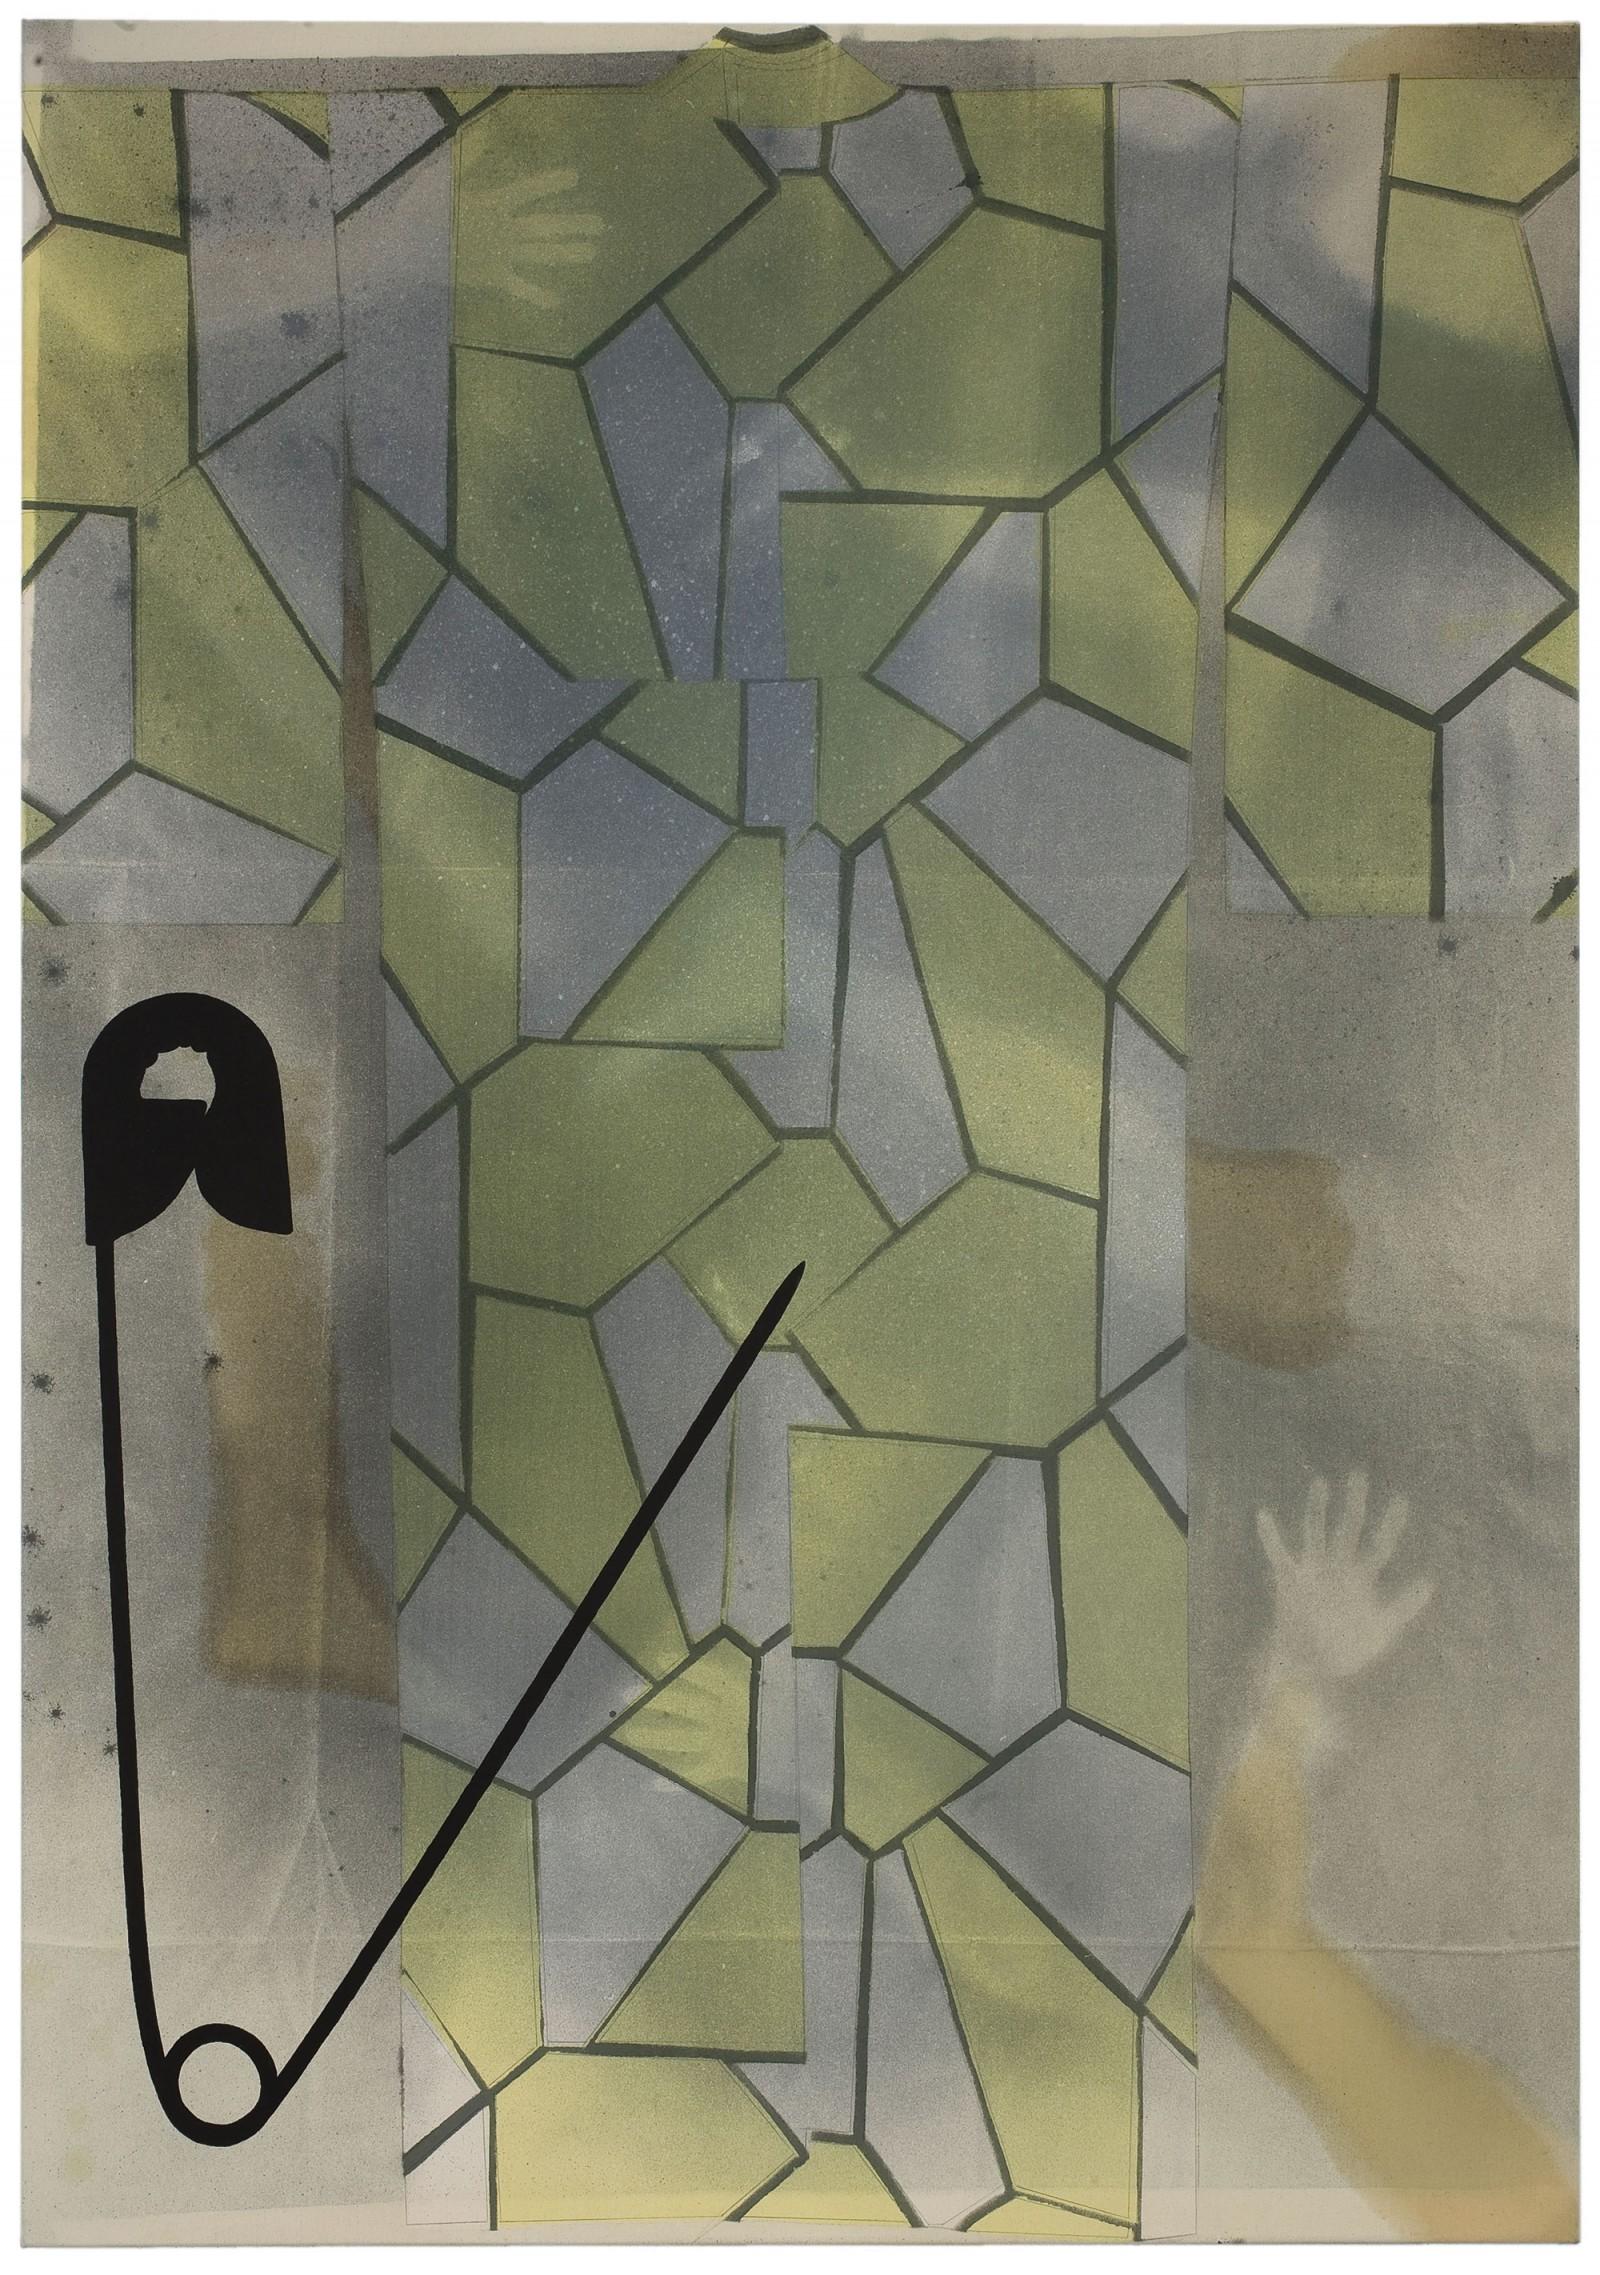 Kim Nekarda: untitled, 2009, vinyl color, poppy oil & body print on cotton, 200 x 140 cm